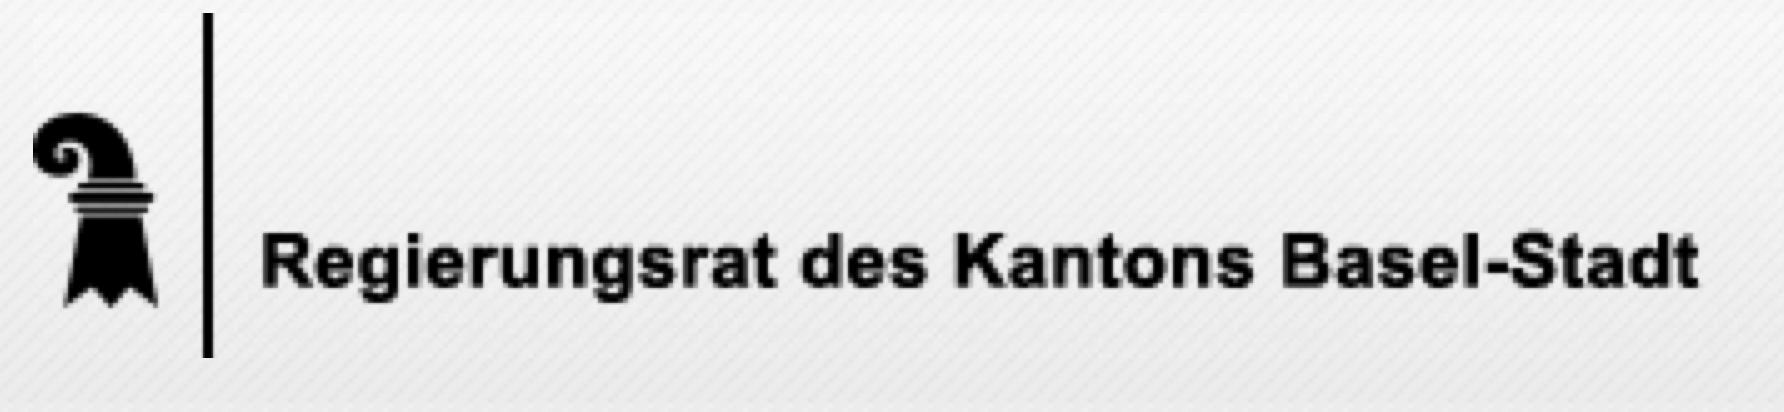 Regierungsrat Basel Stadt